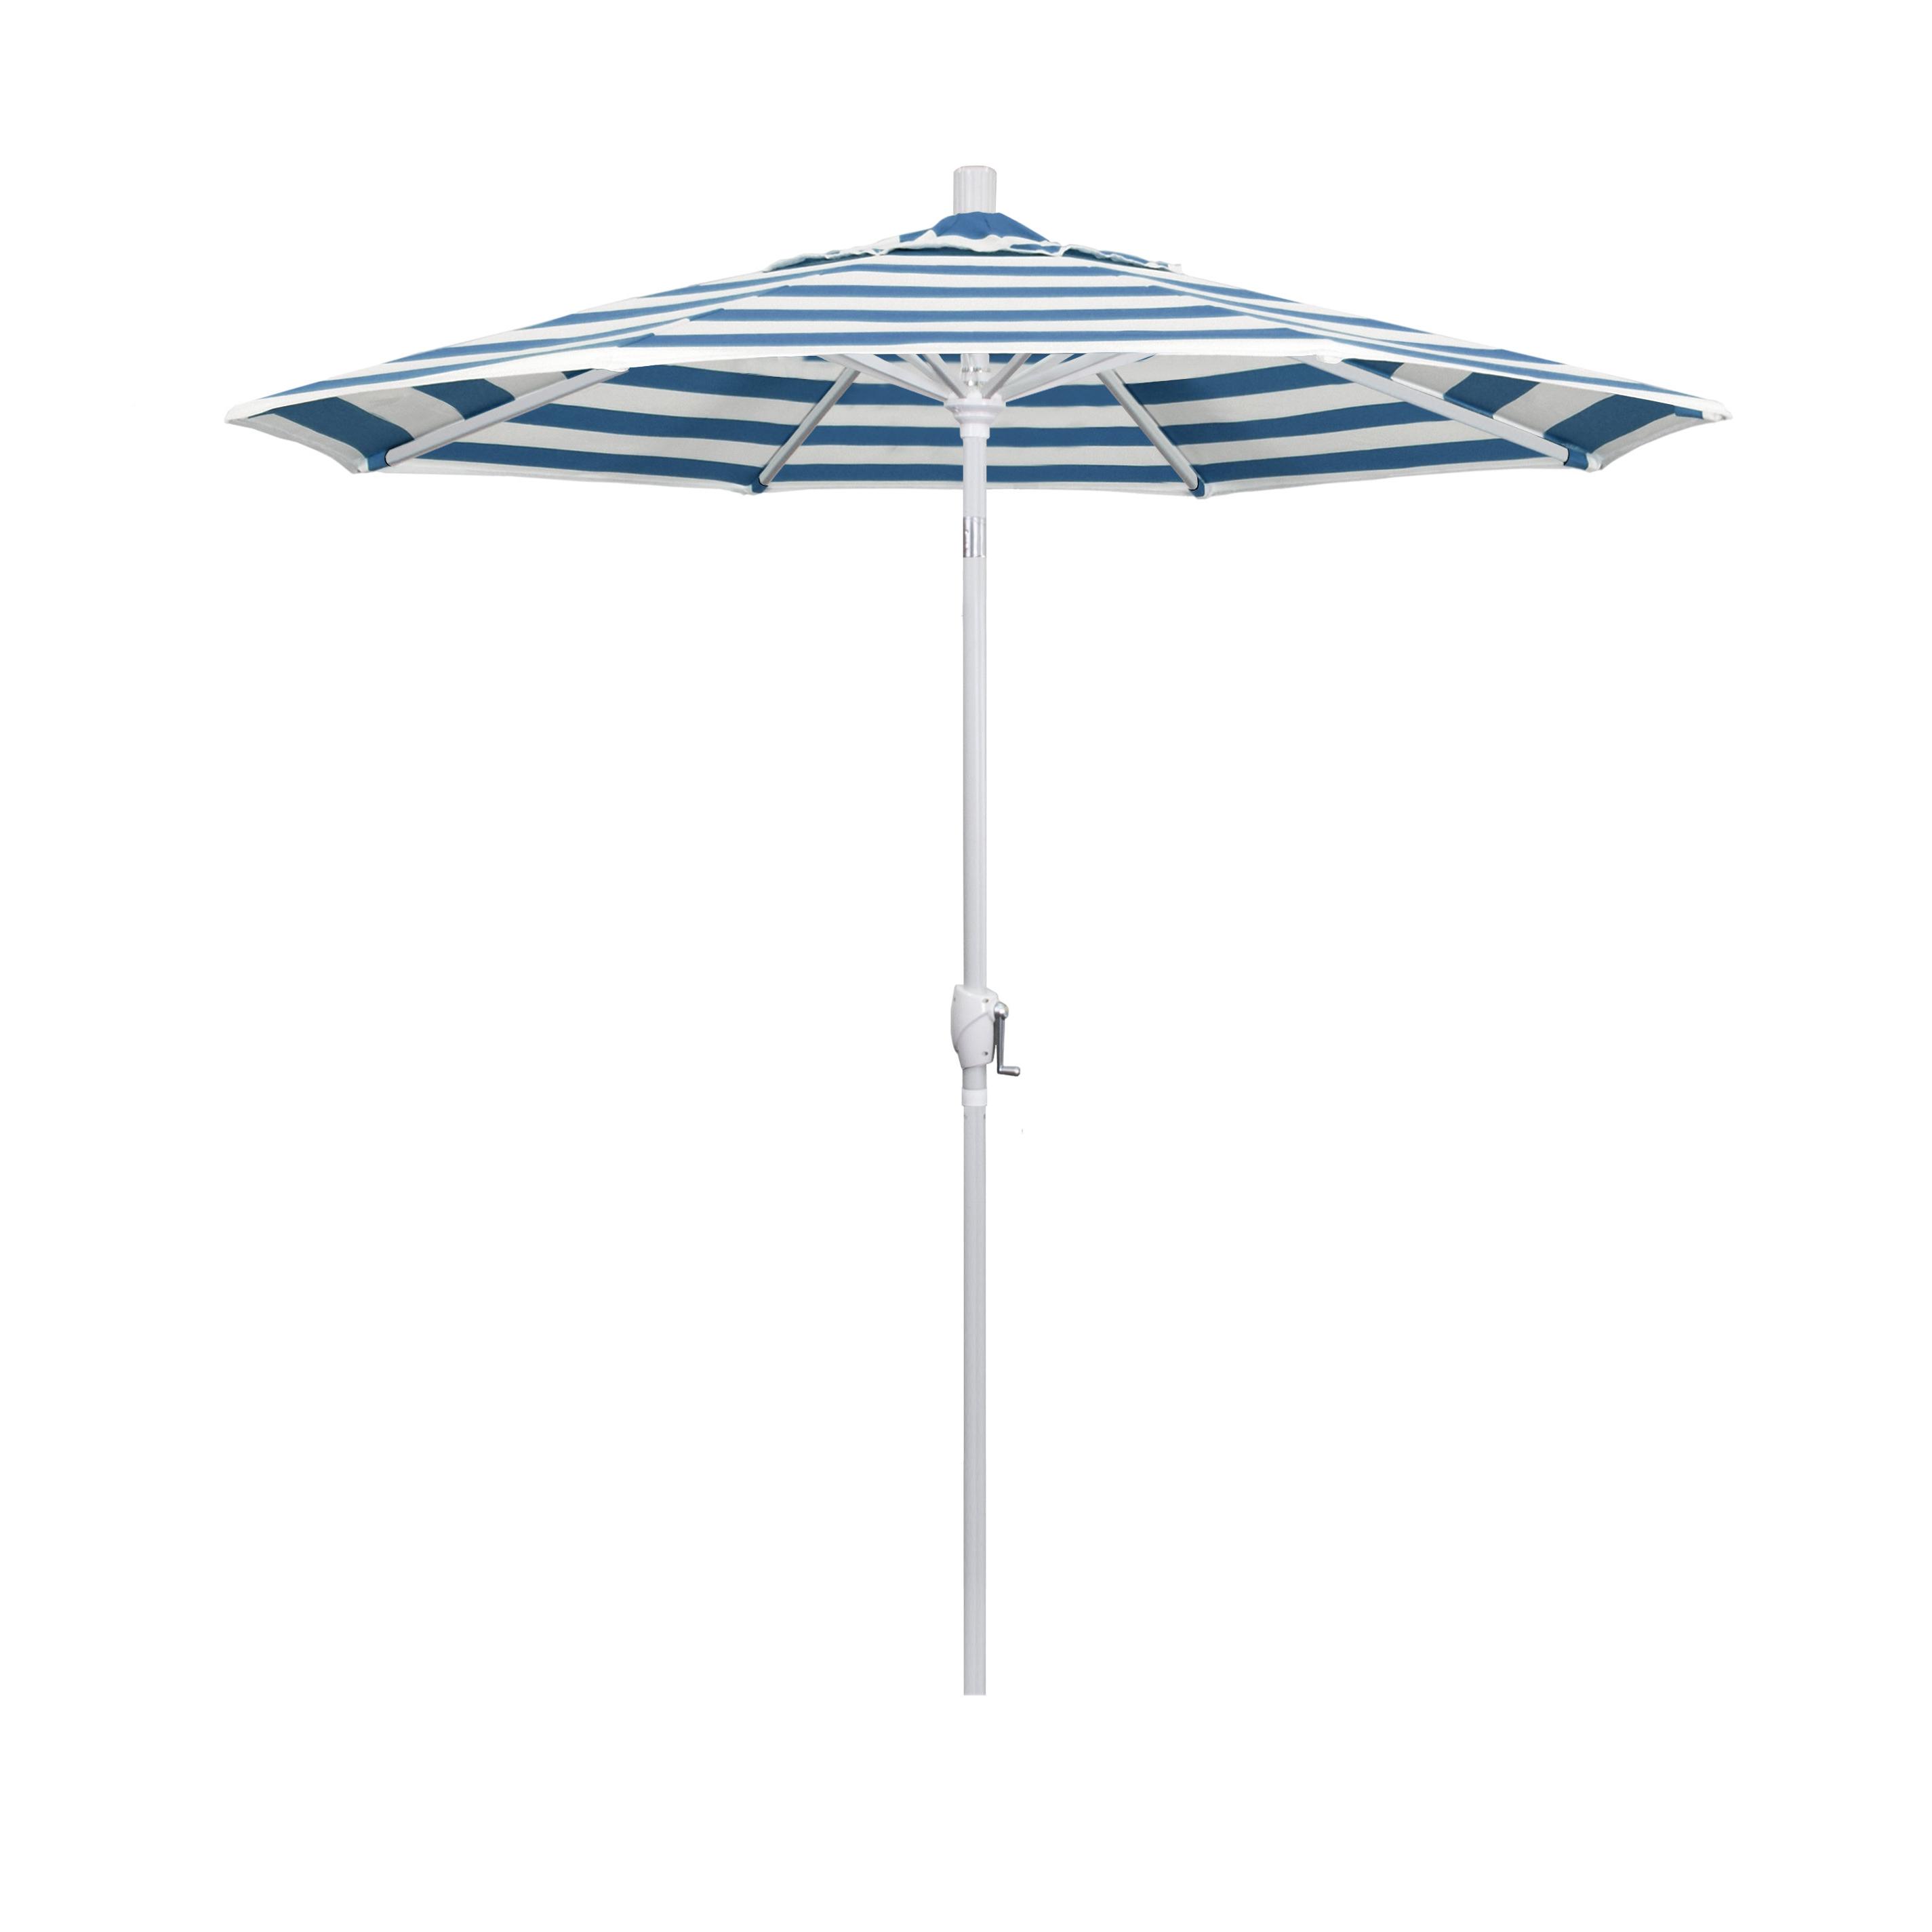 Wallach Market Sunbrella Umbrellas With Famous  (View 20 of 20)